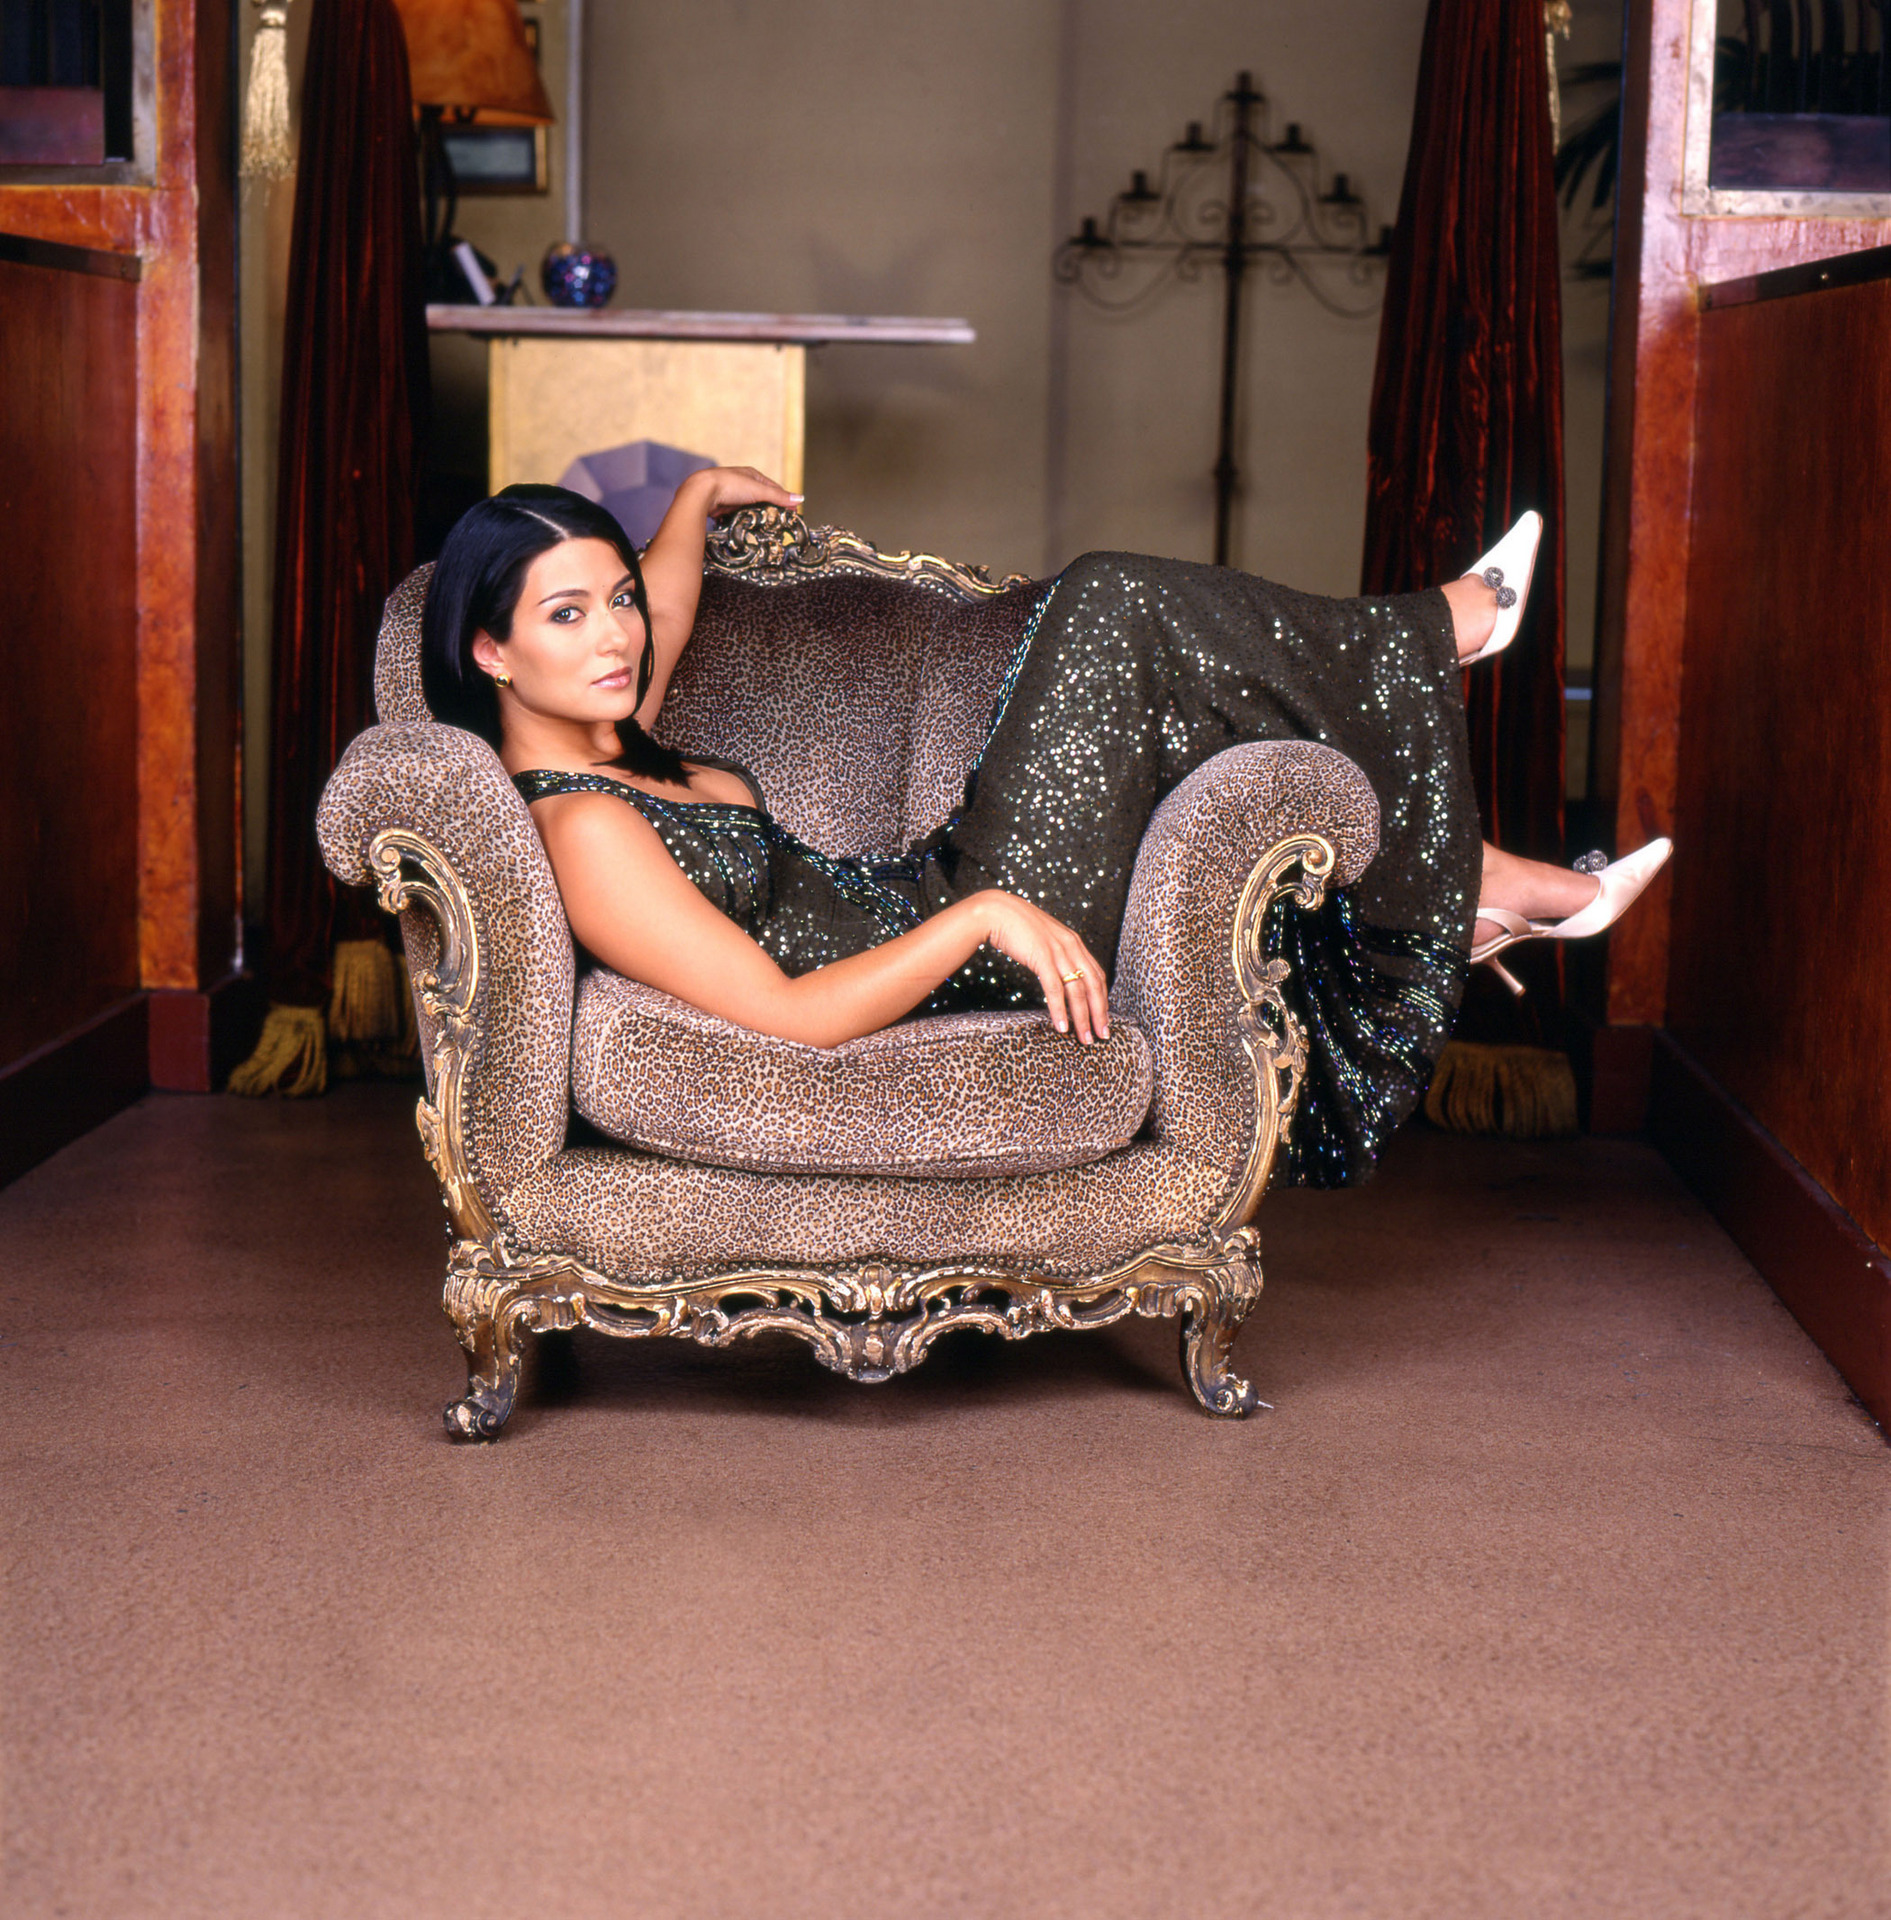 Marisol nichols strip search apologise